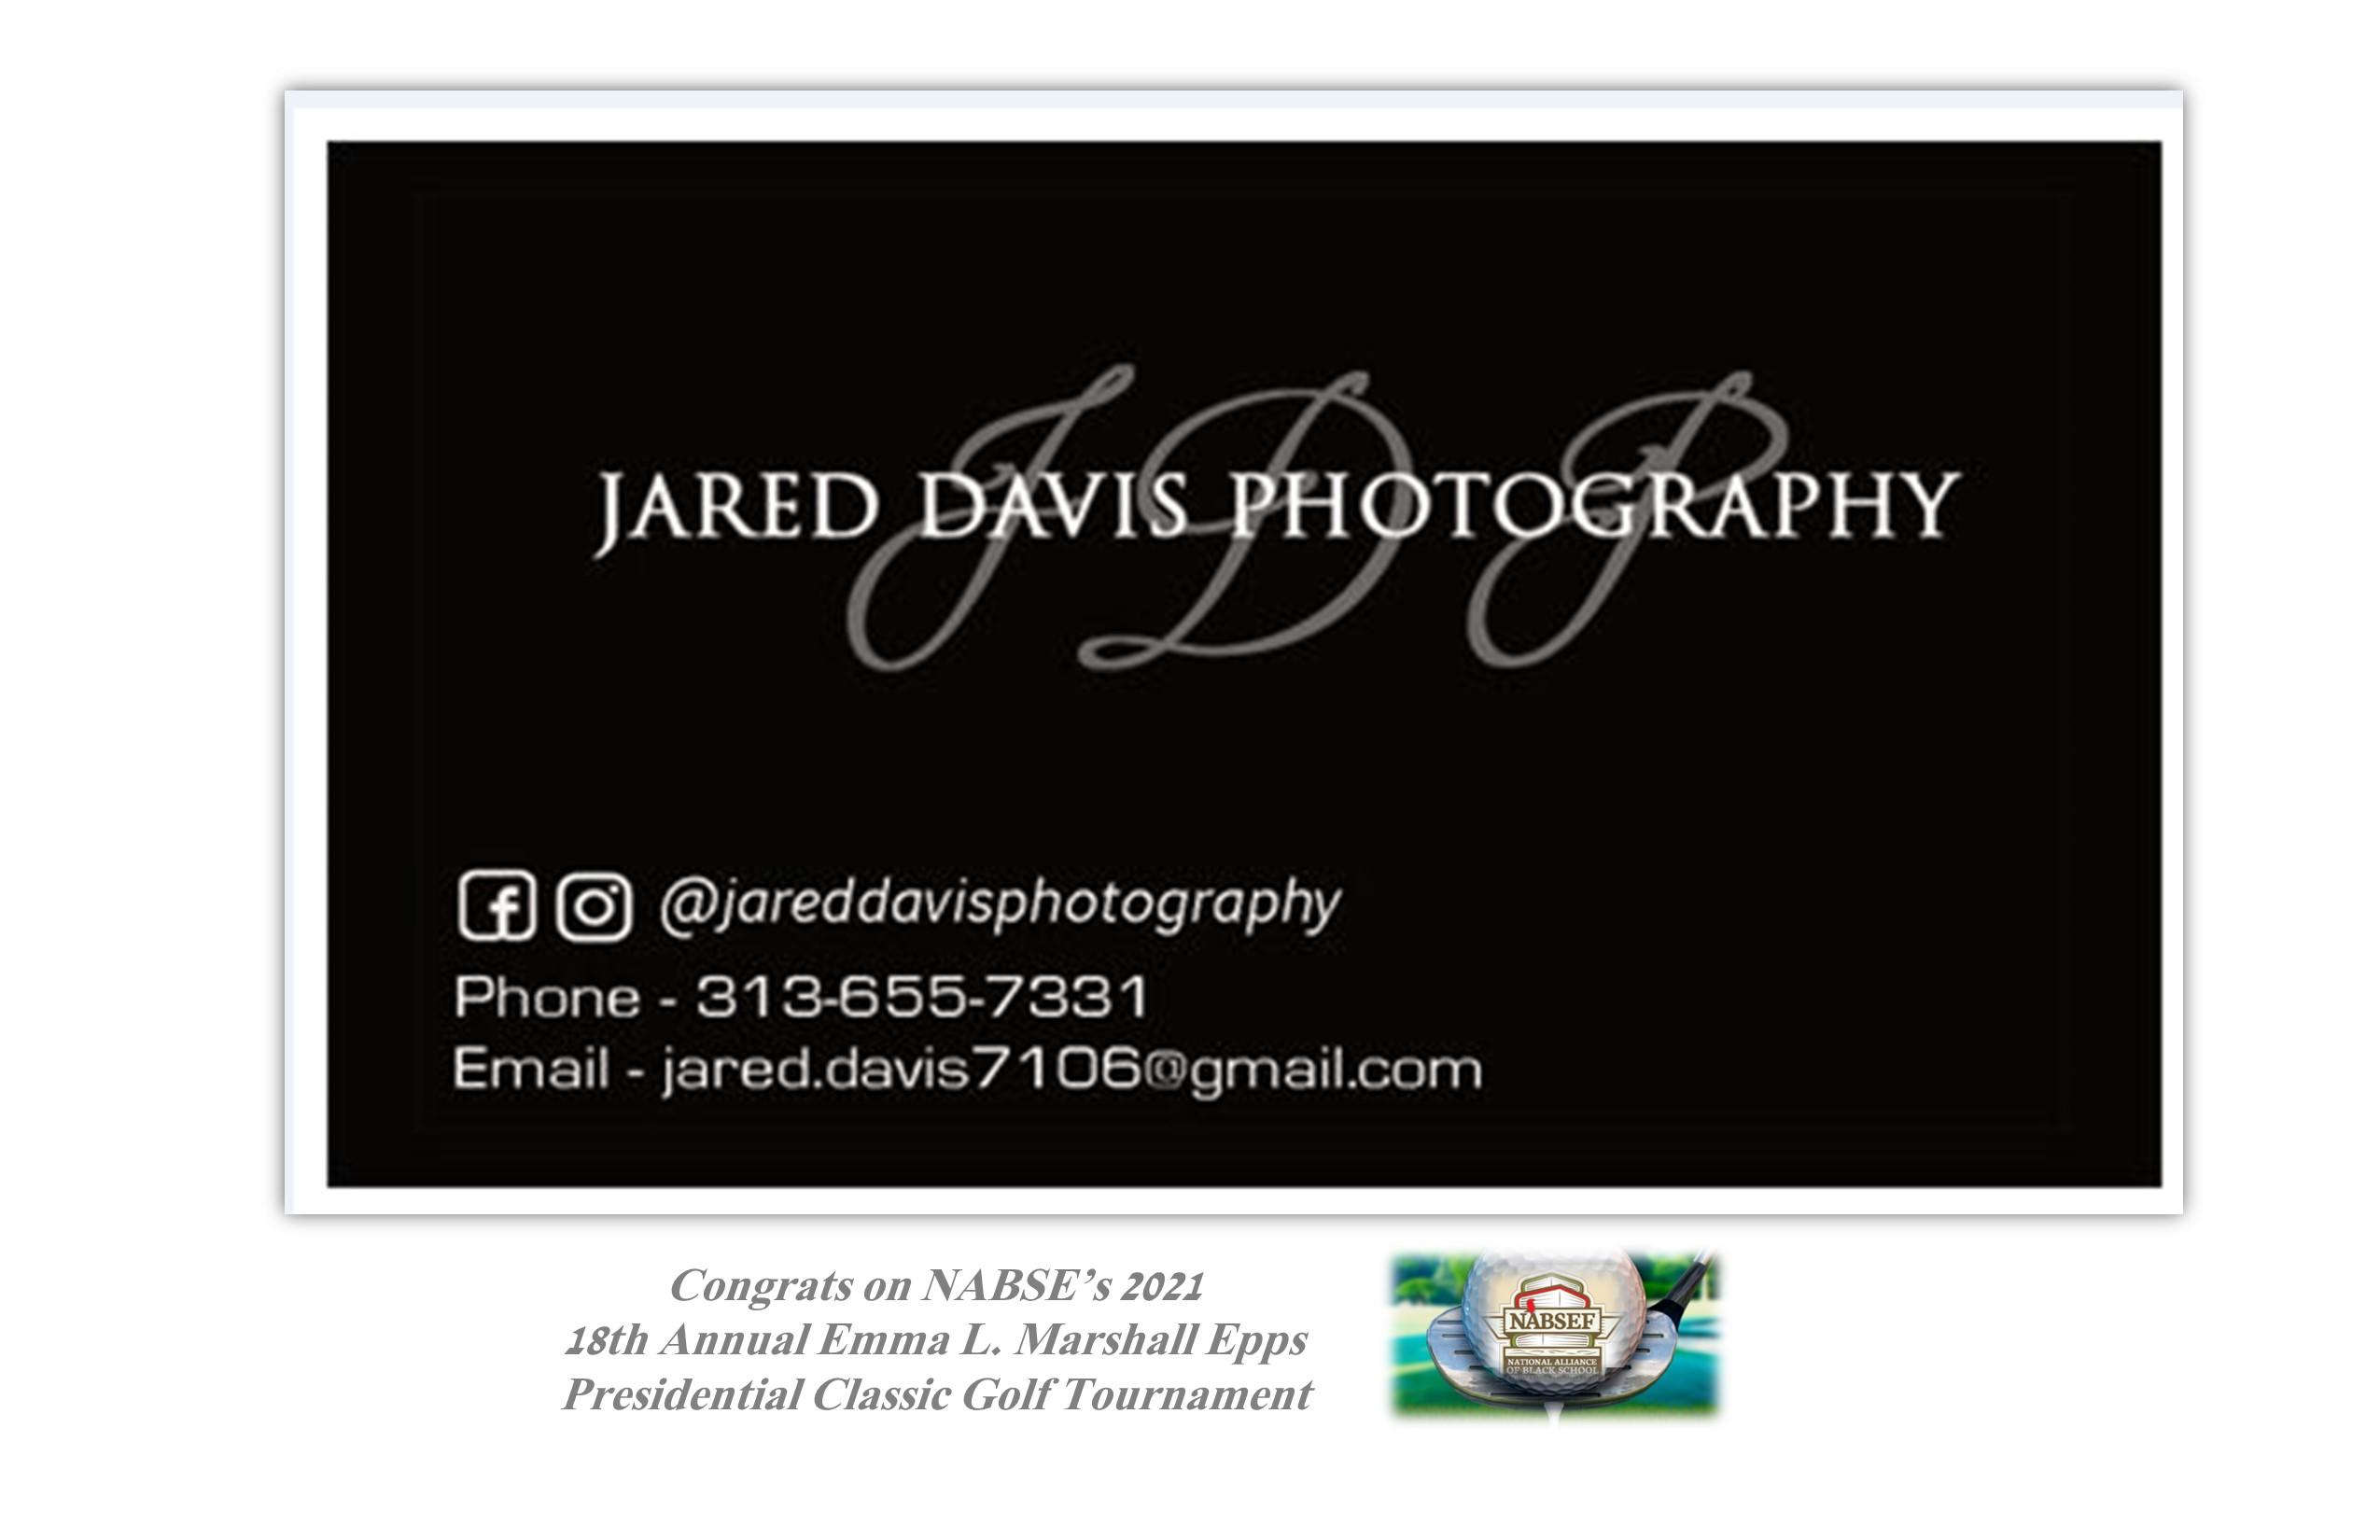 Jared Davis Photography